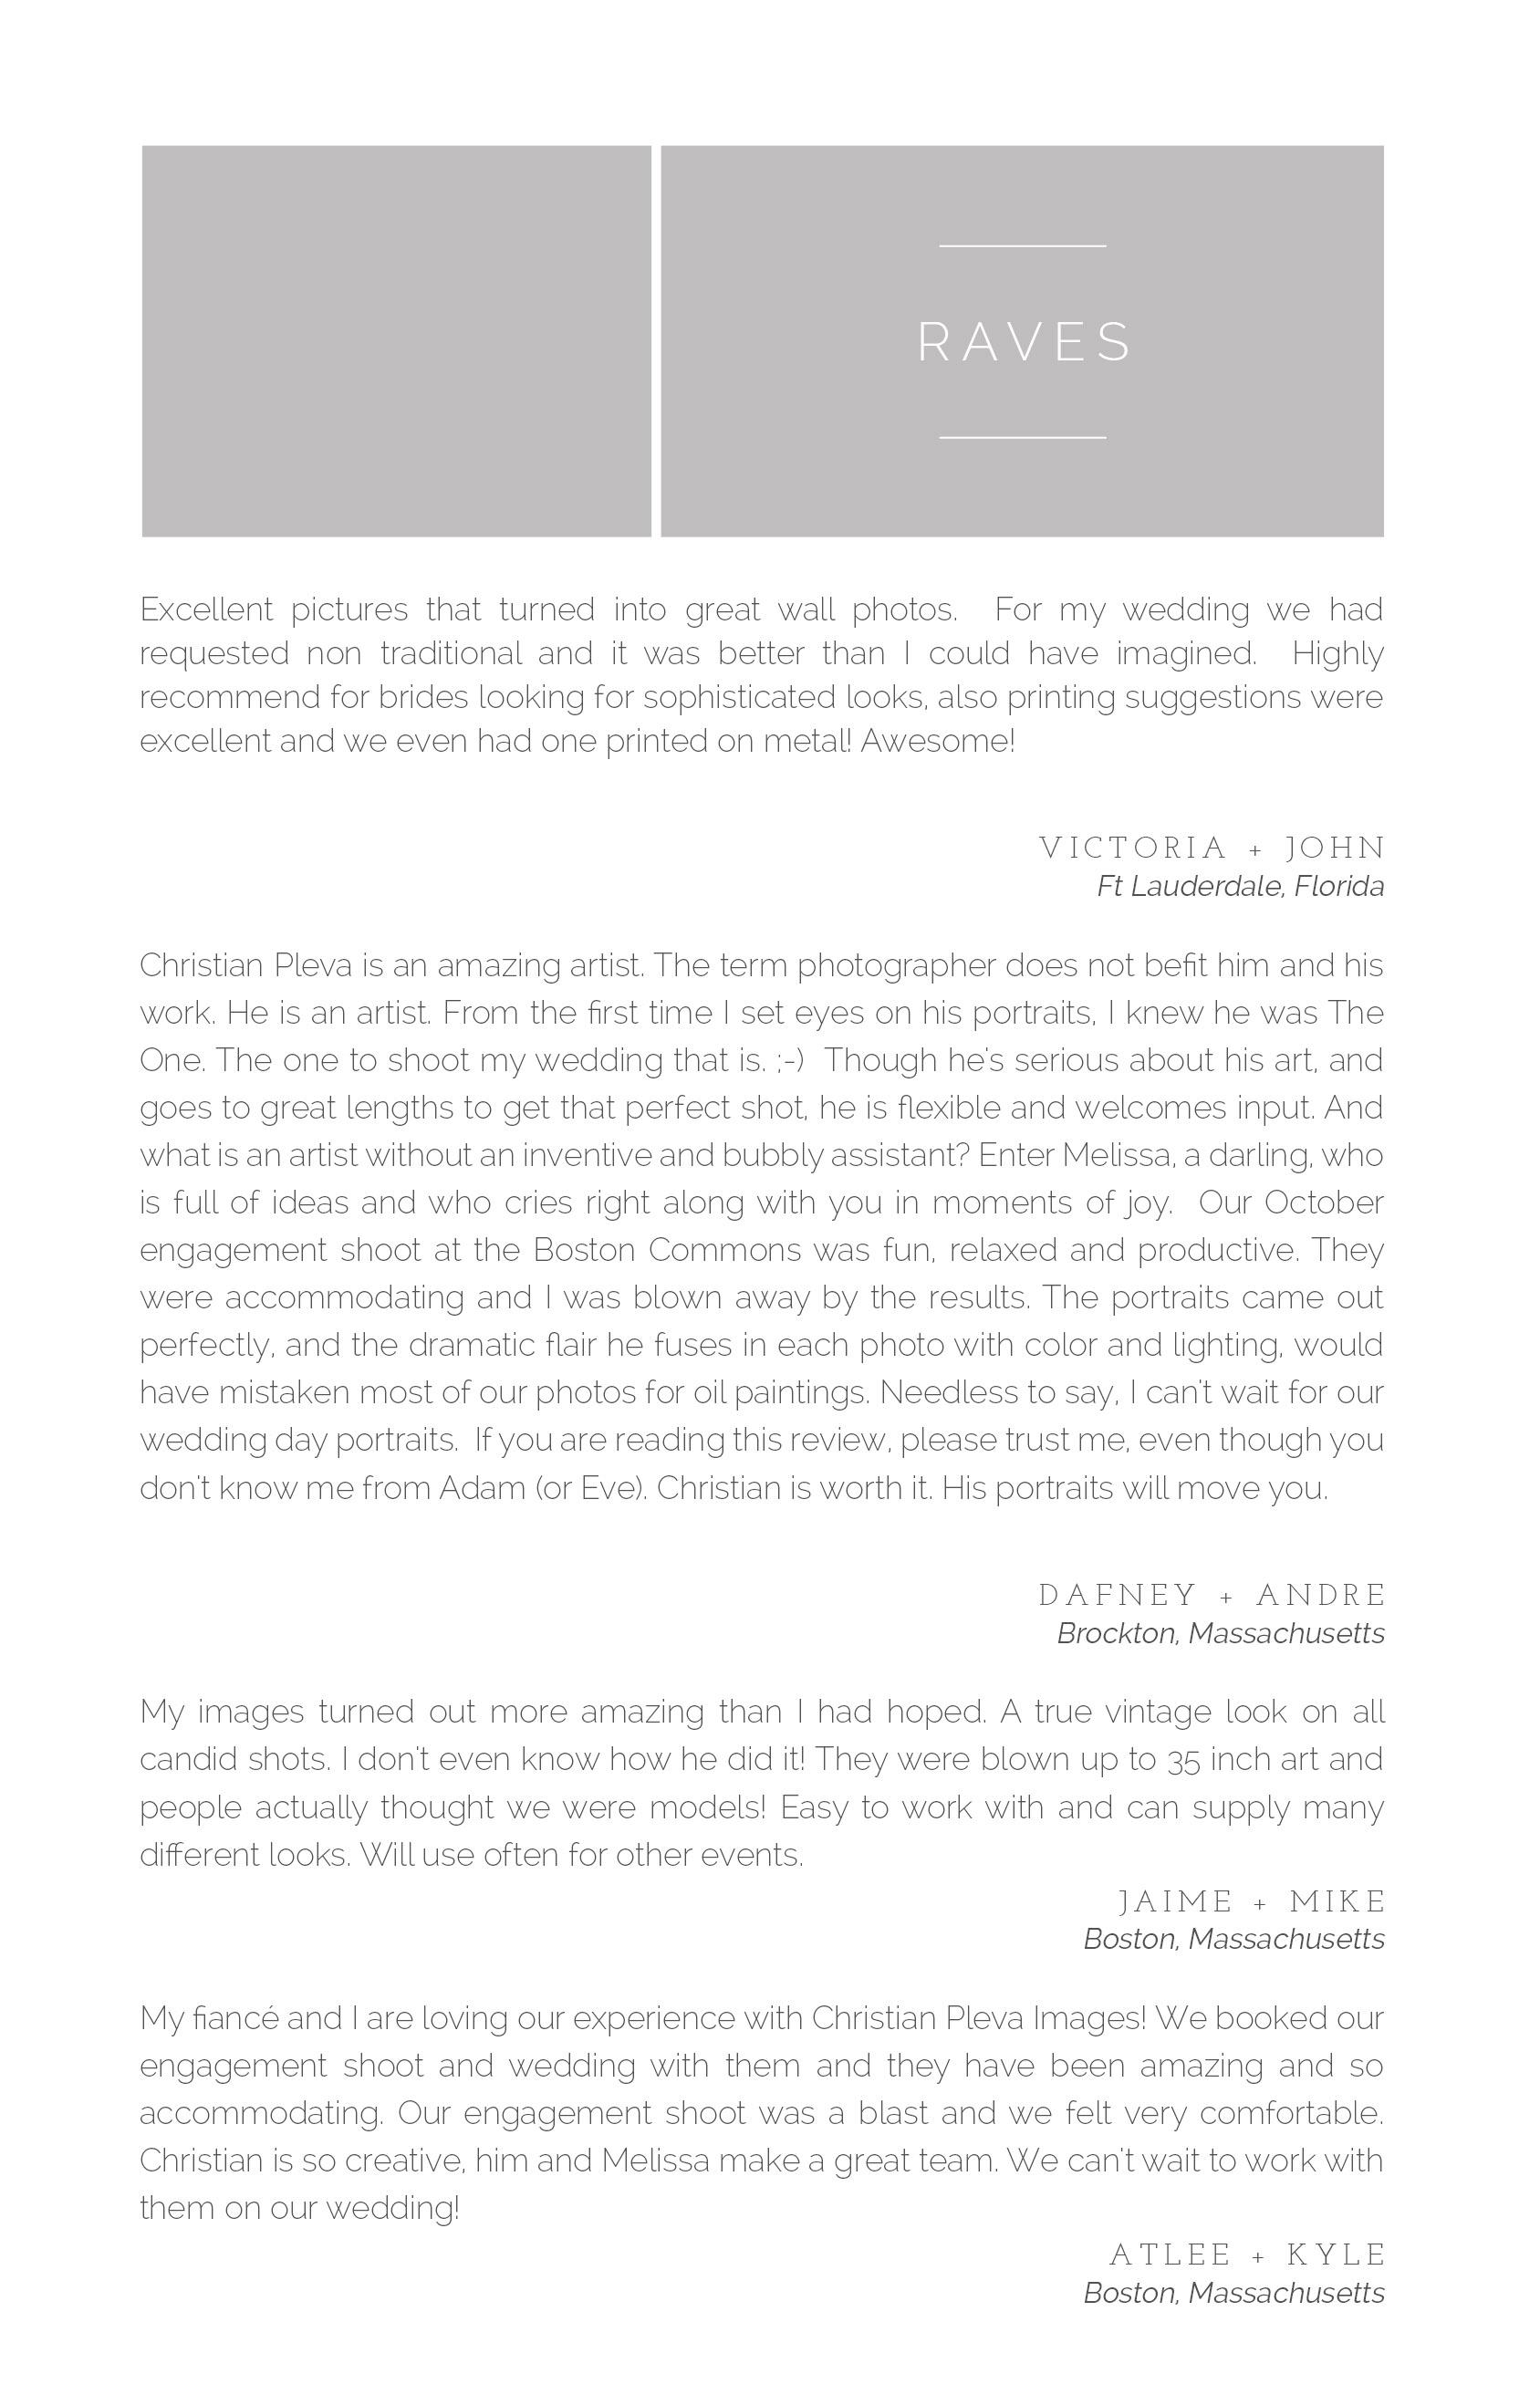 CPI.brochure.7.jpg